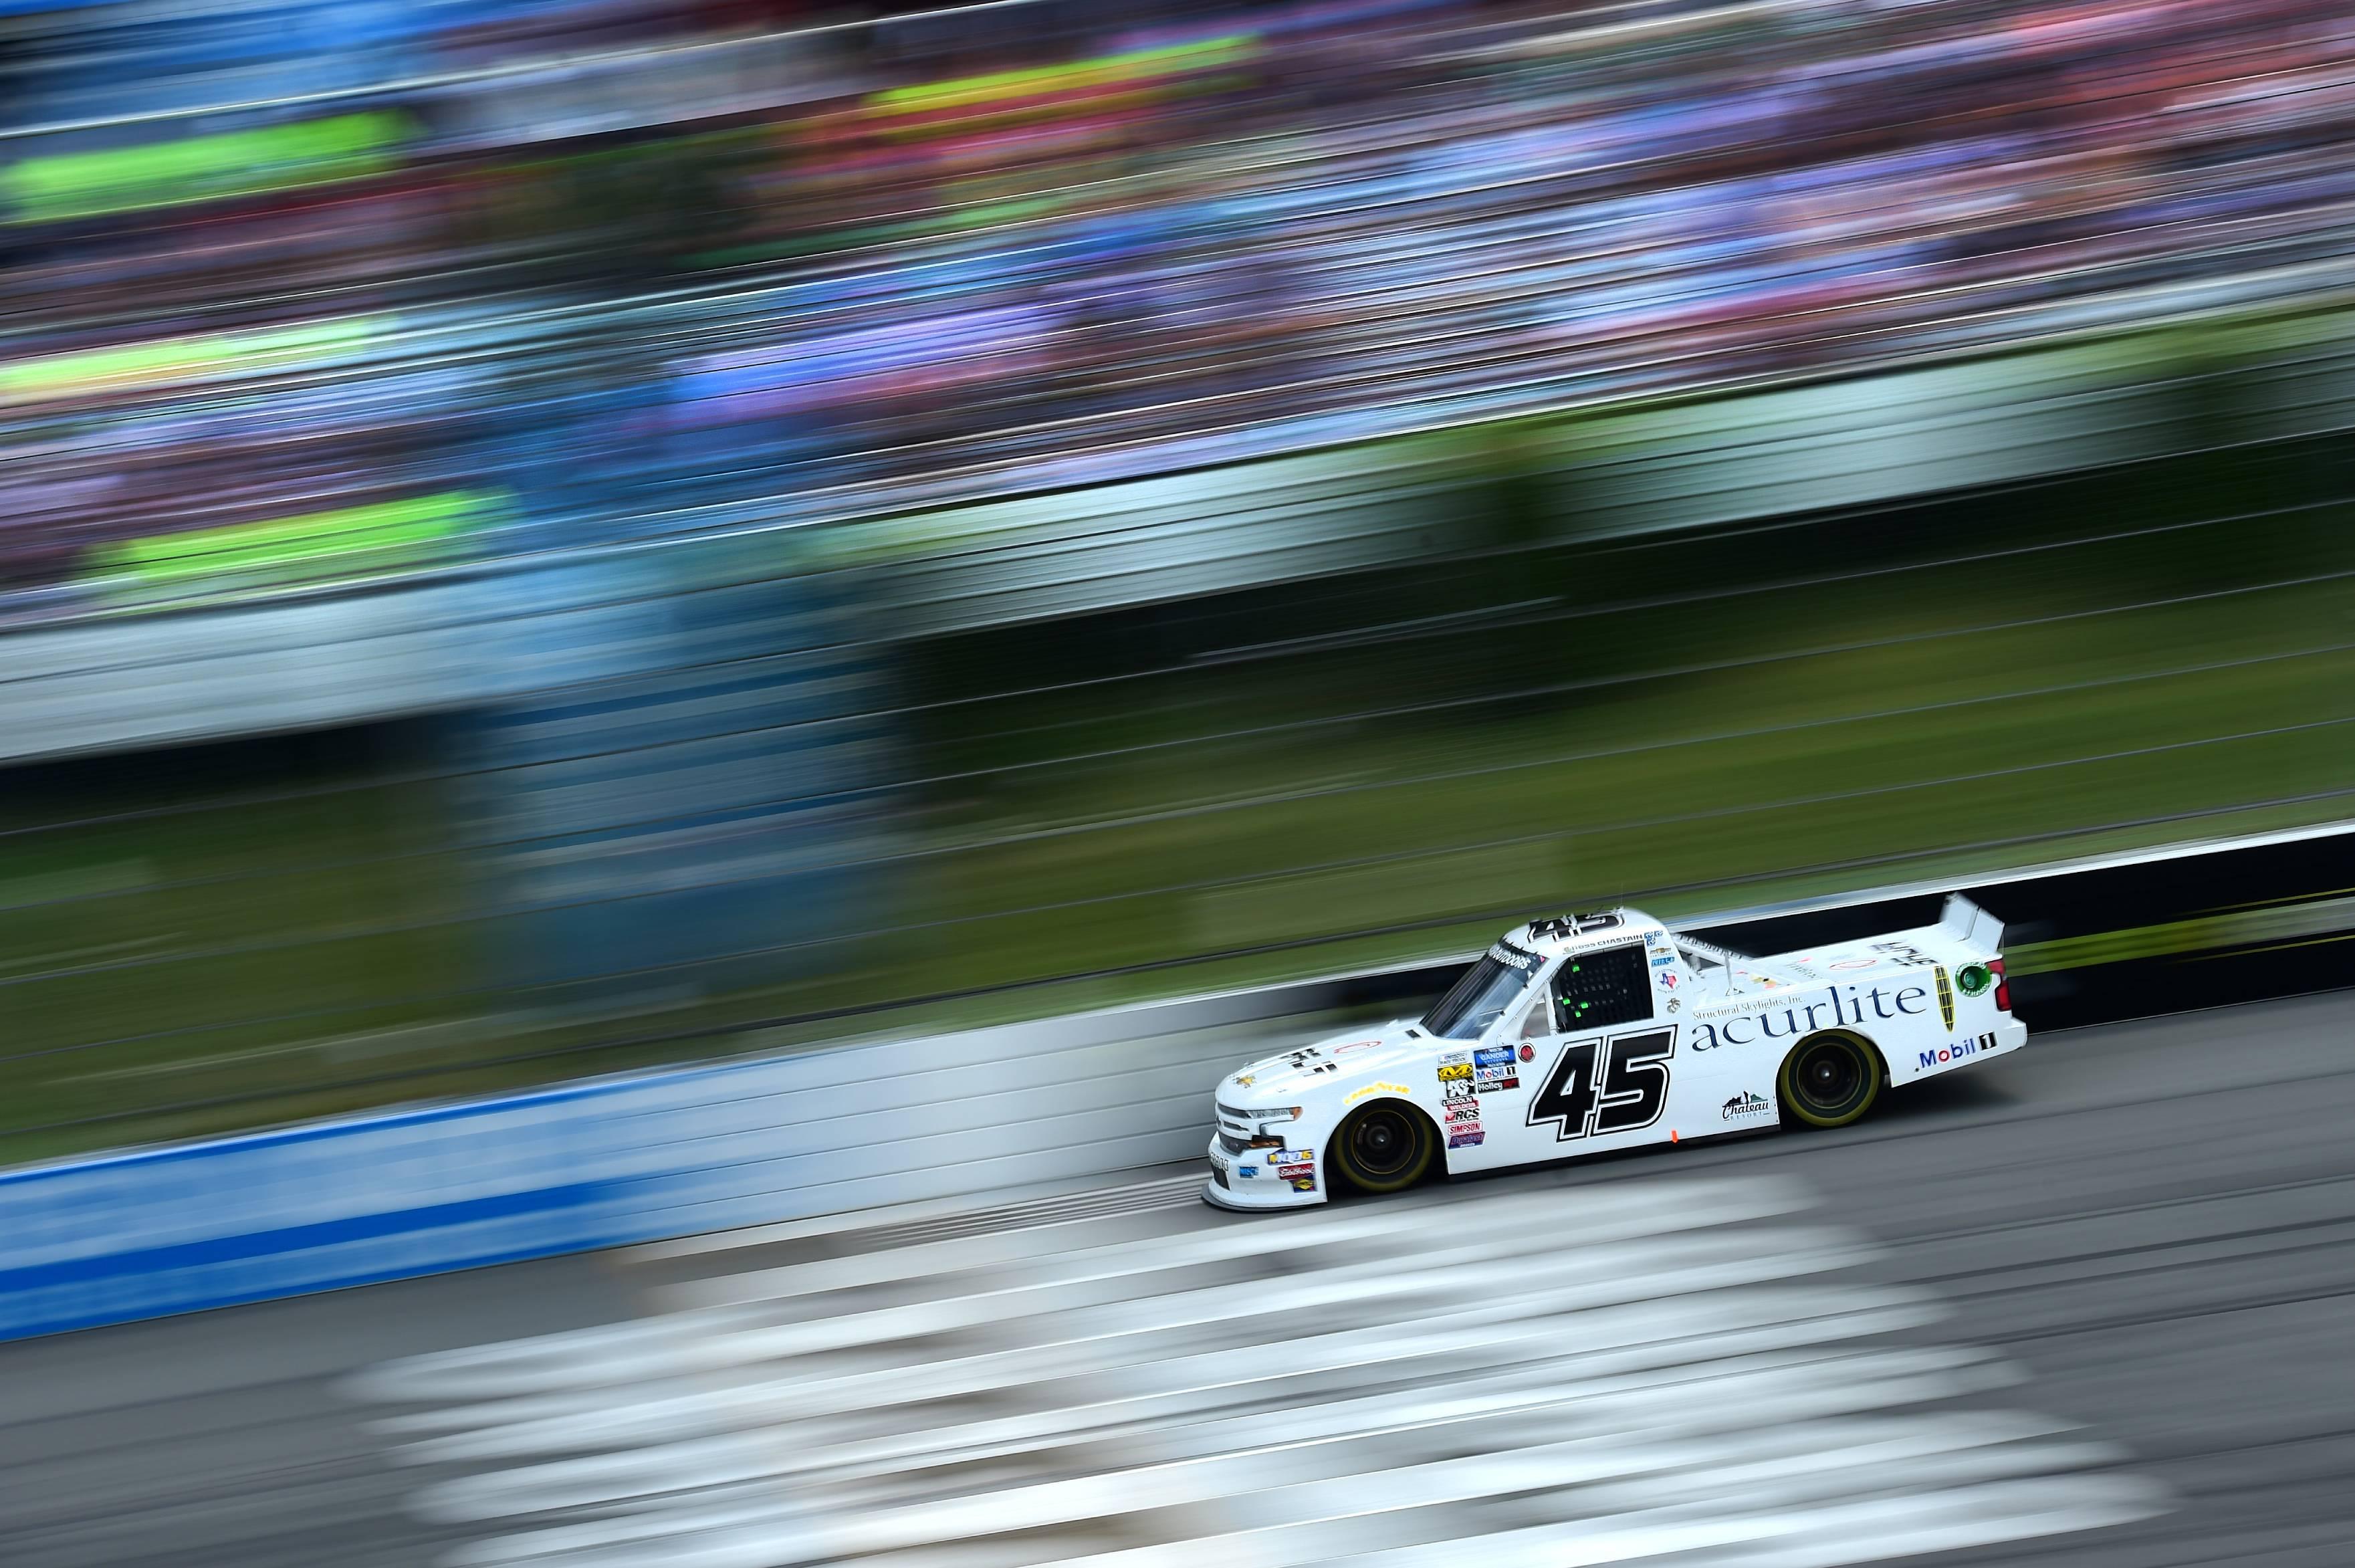 Ross Chastain at Pocono Raceway